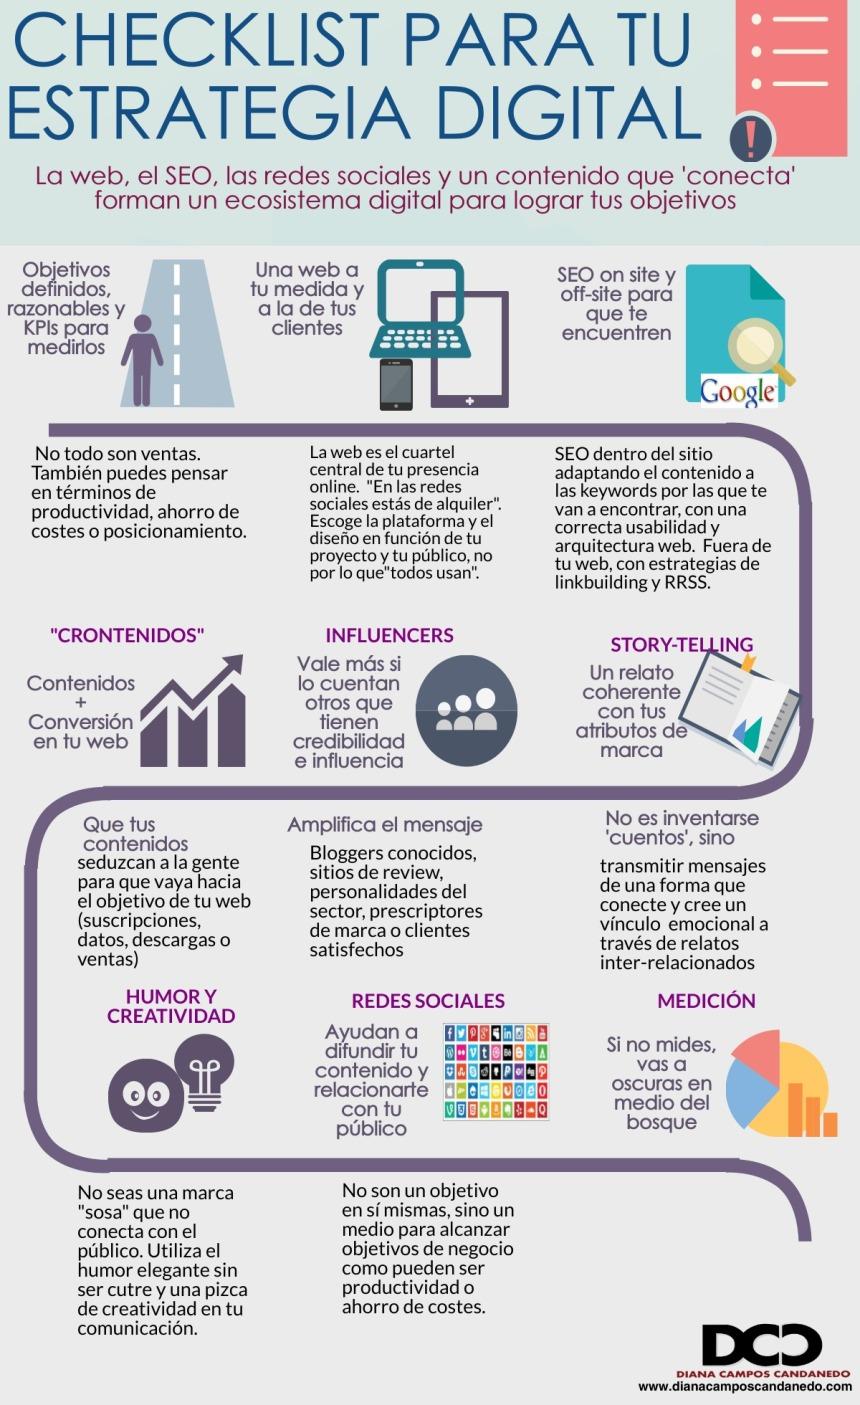 Checklist para tu estrategia digital